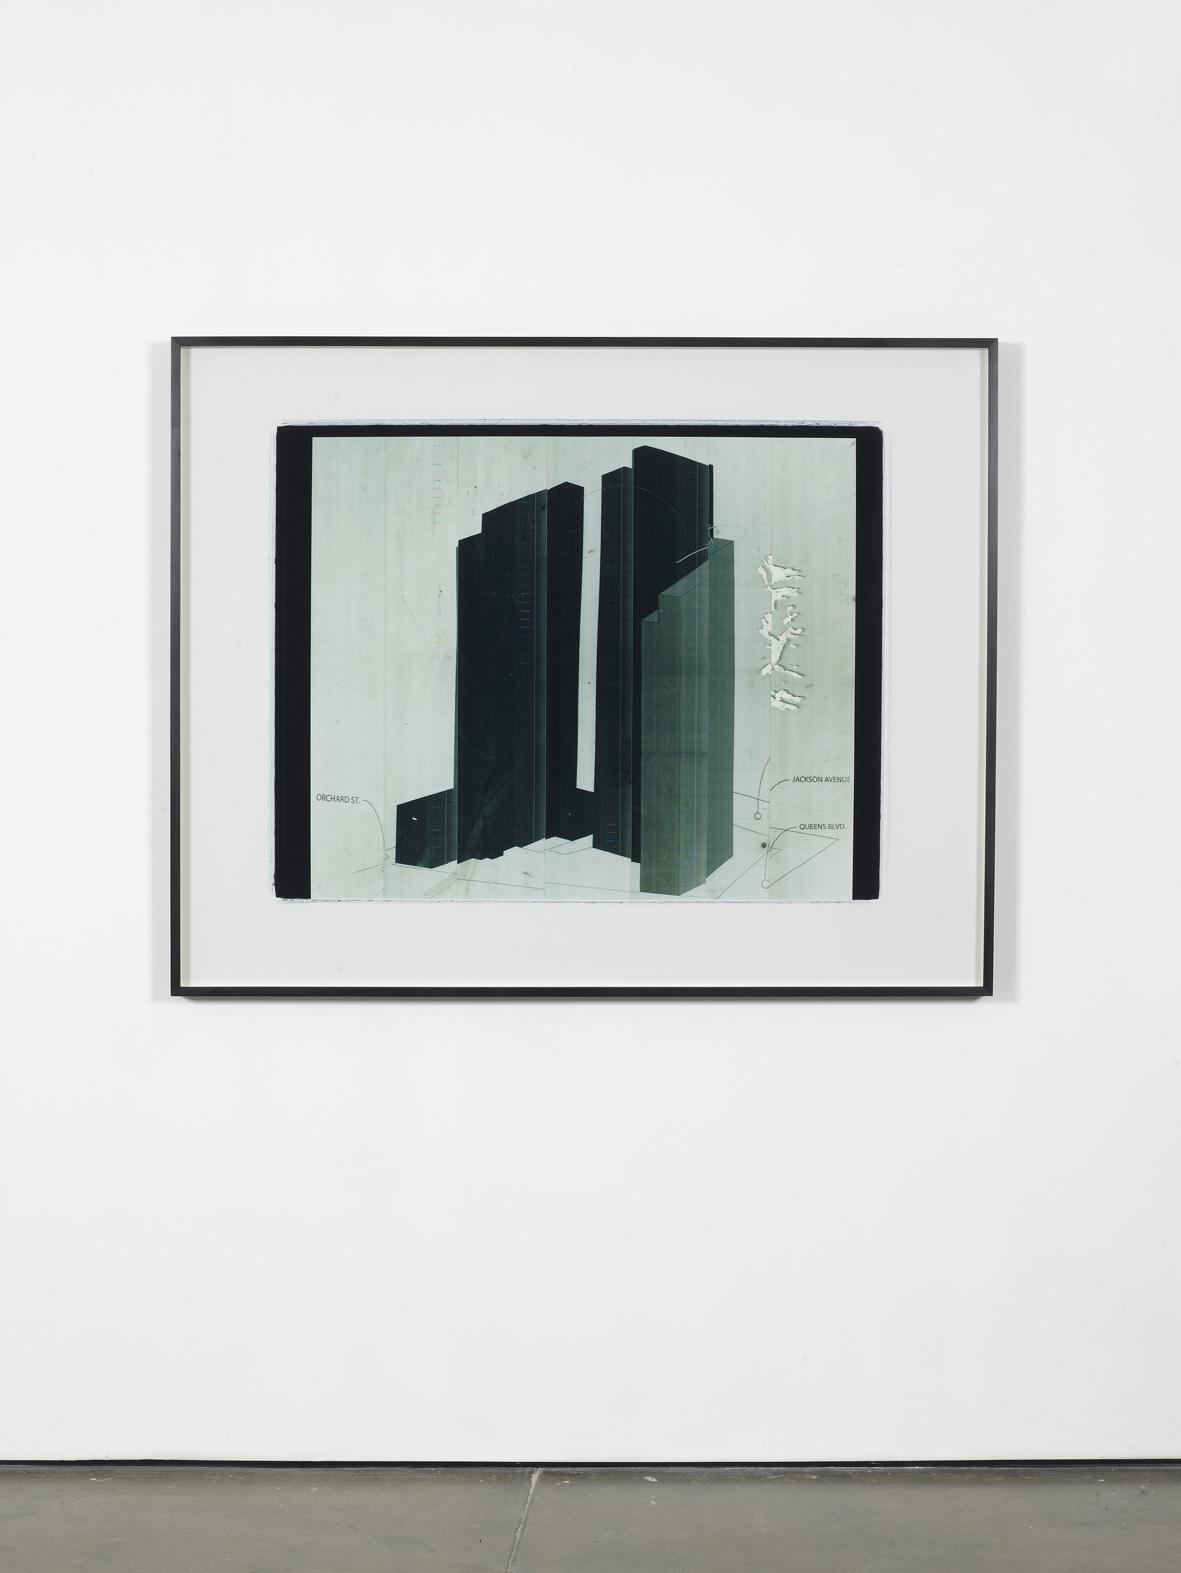 Nick Relph Irene 2016 C-print 127 x 101.6 cm / 50 x 40 in